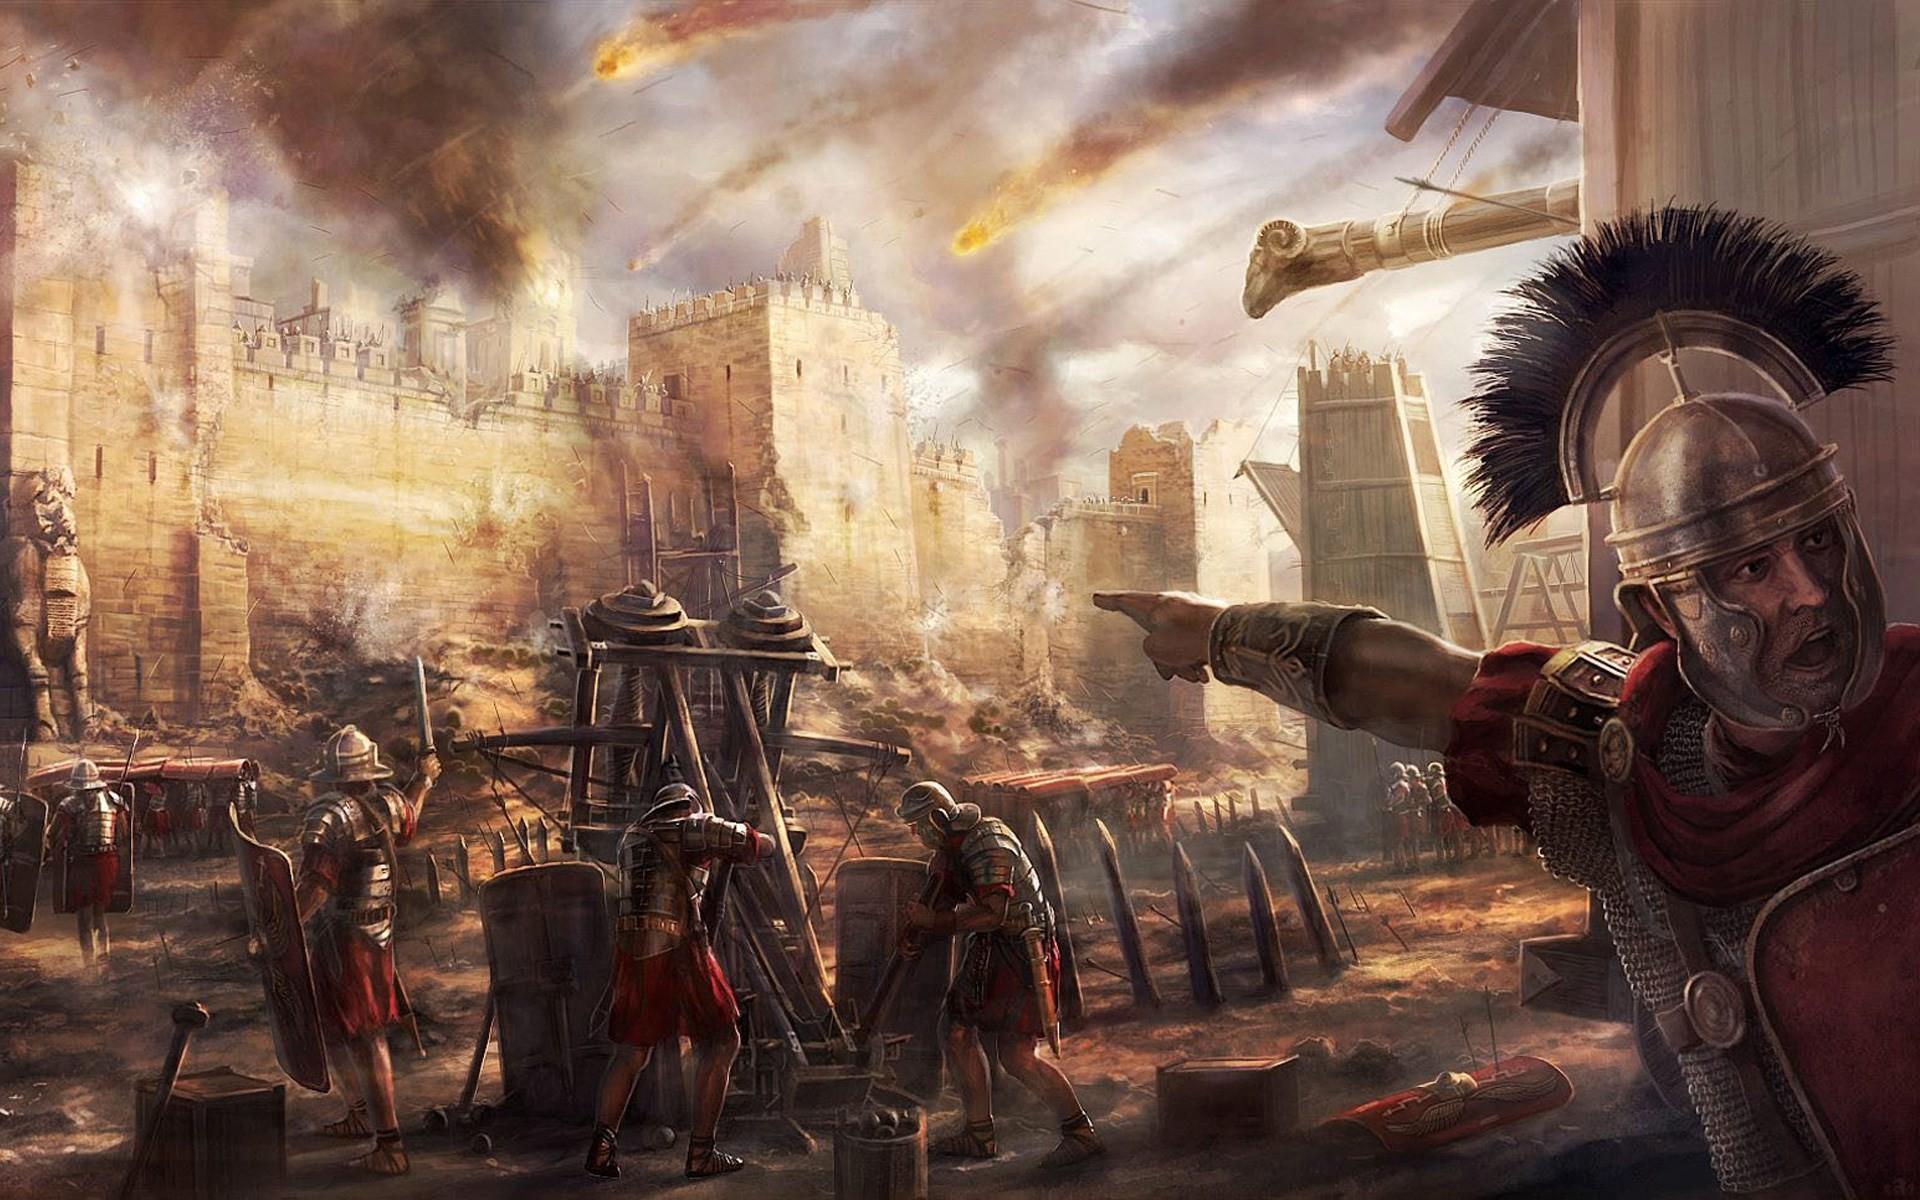 Free Awesome Total War: Rome II wallpaper – Total War: Rome II category